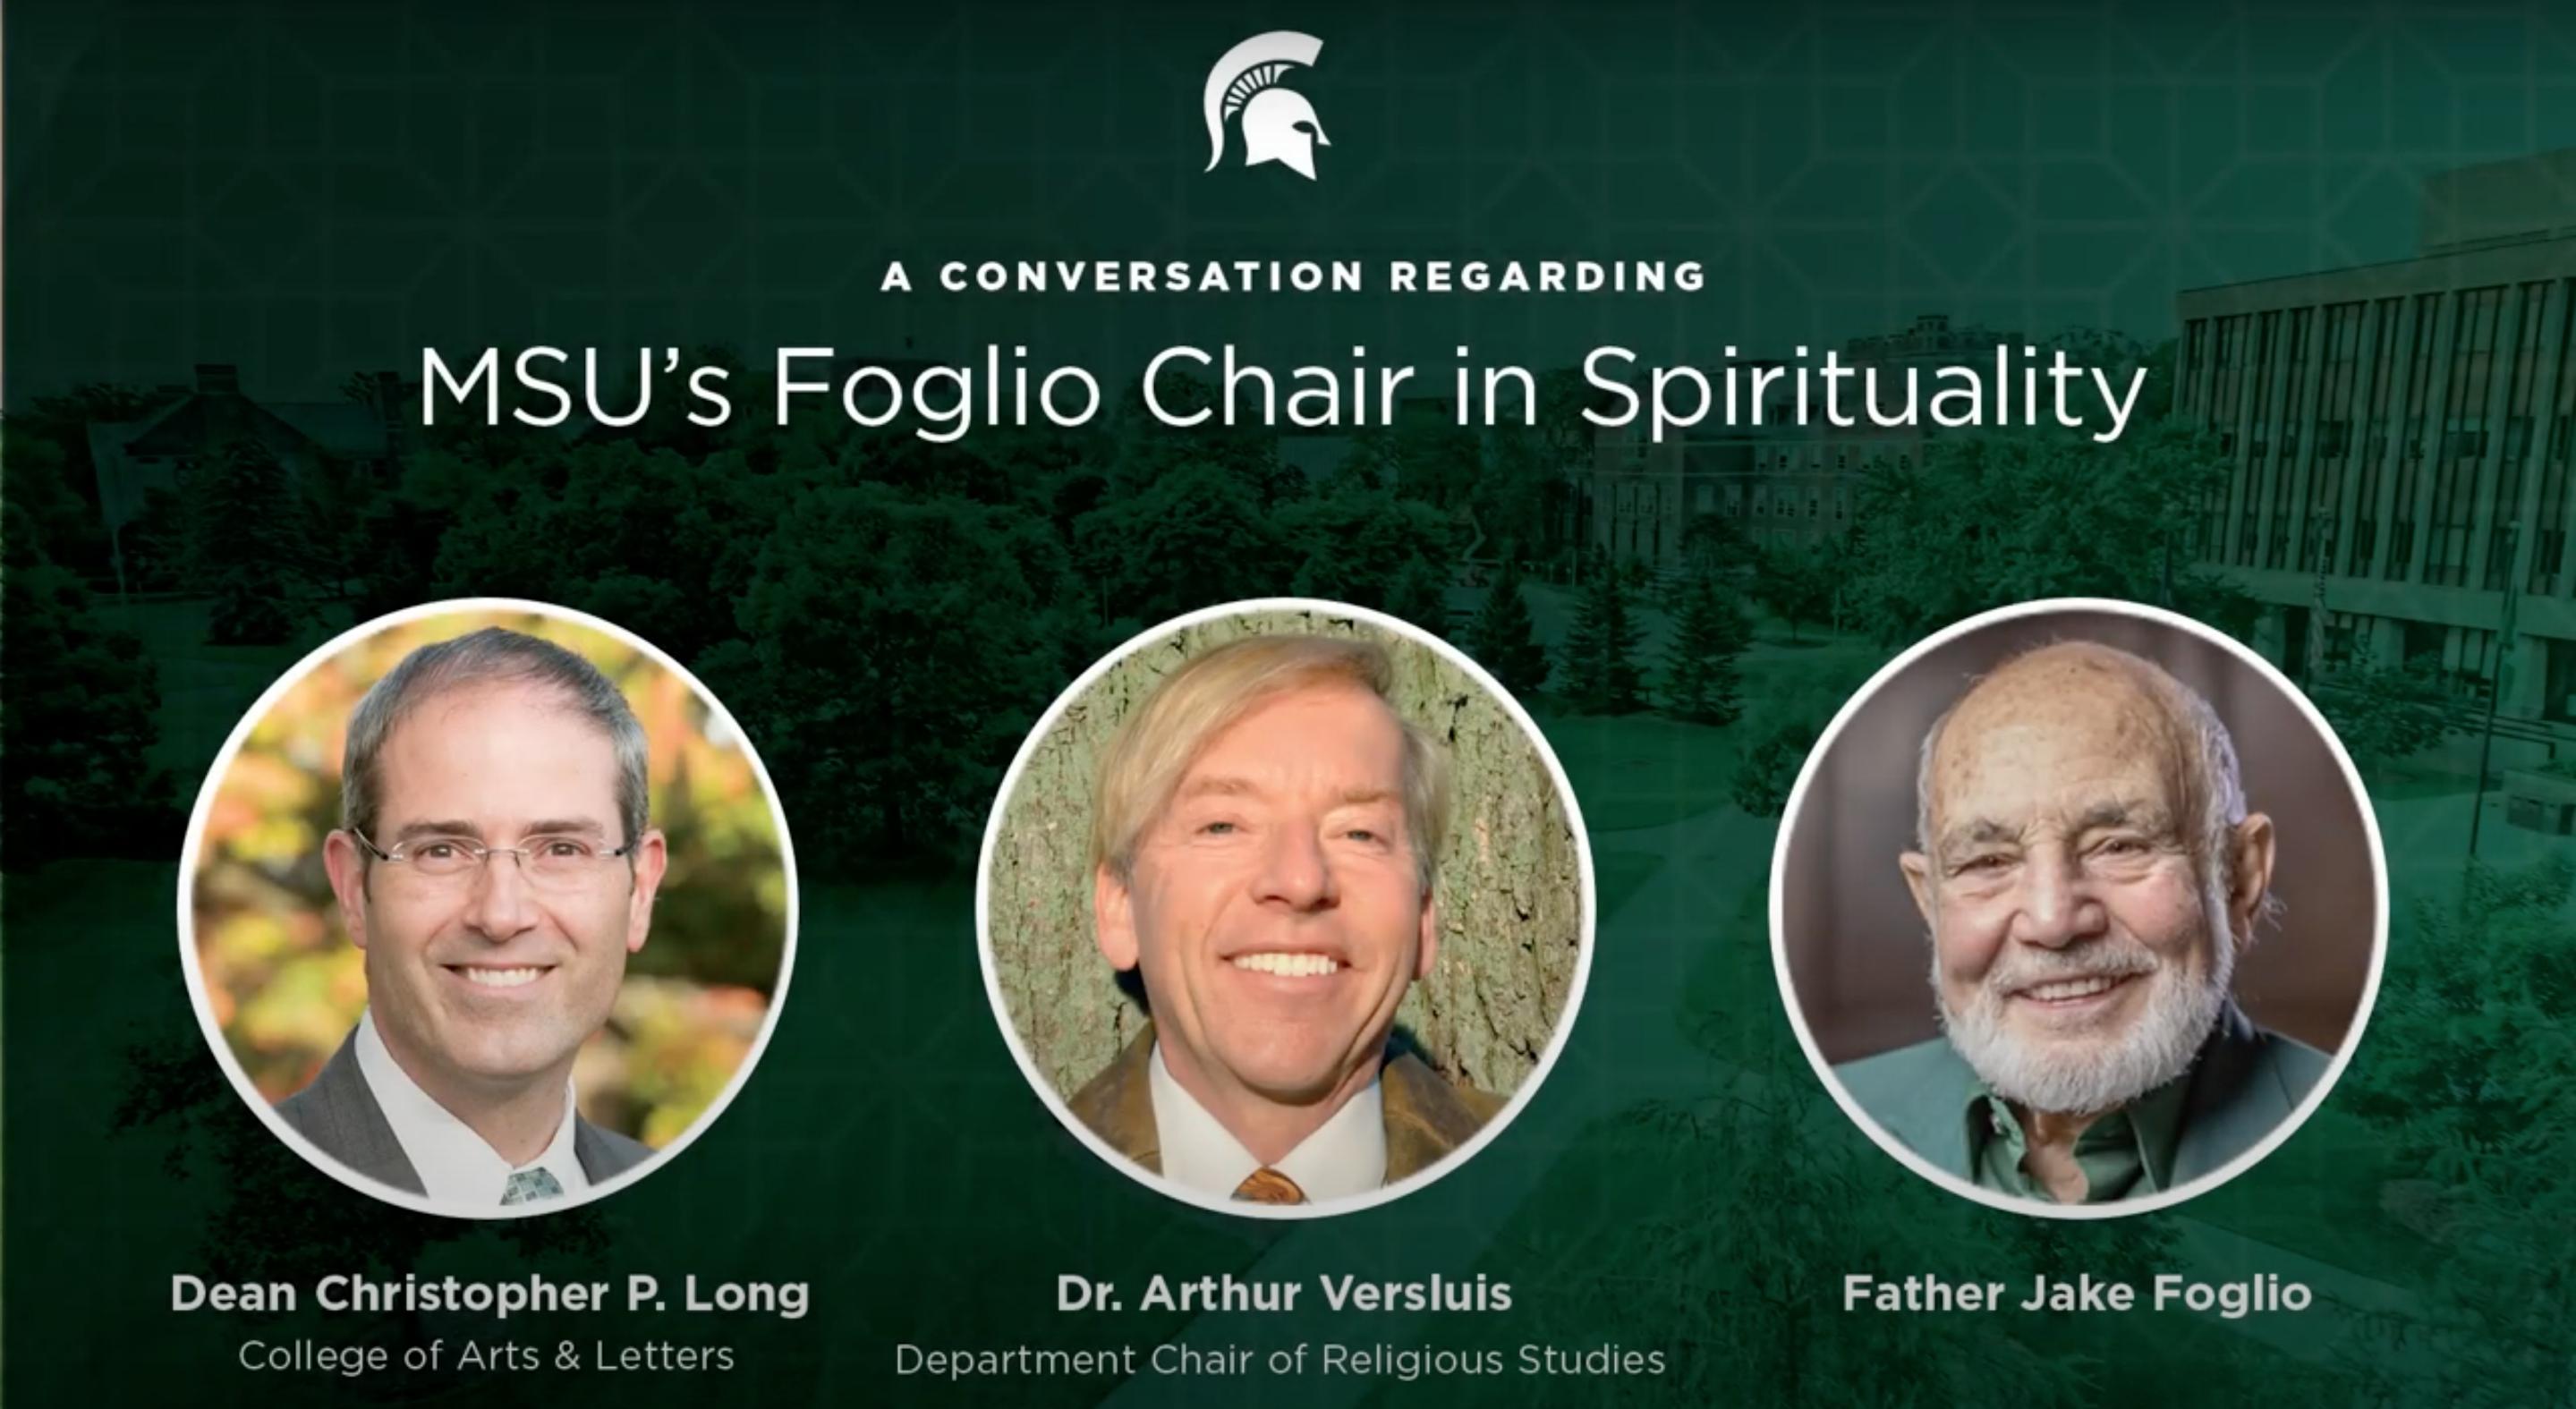 Video: A Conversation About MSU's Foglio Chair in Spirituality